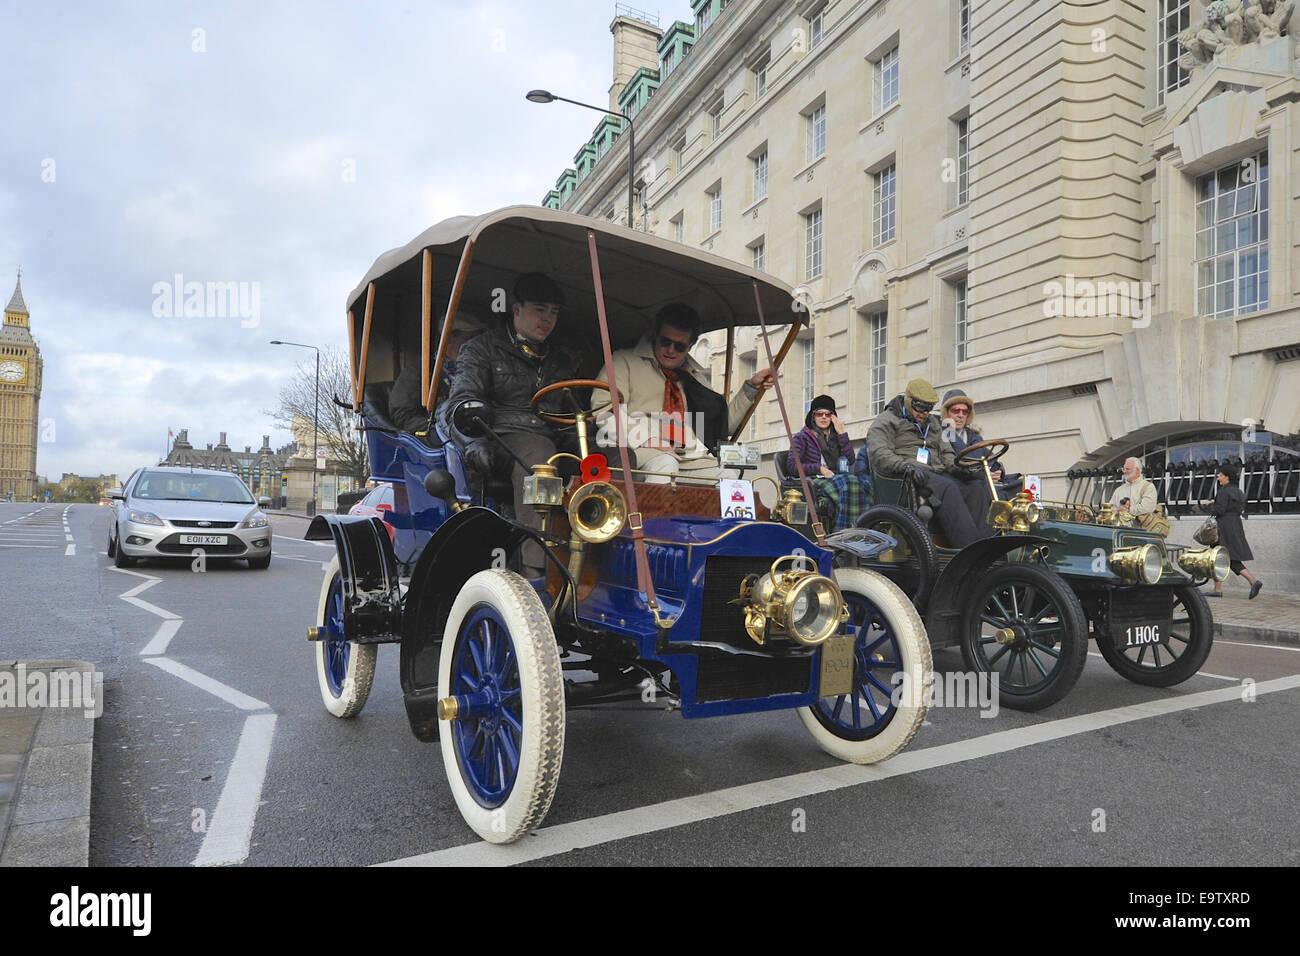 London, UK. 02nd Nov, 2014. Vintage cars driving through London ...